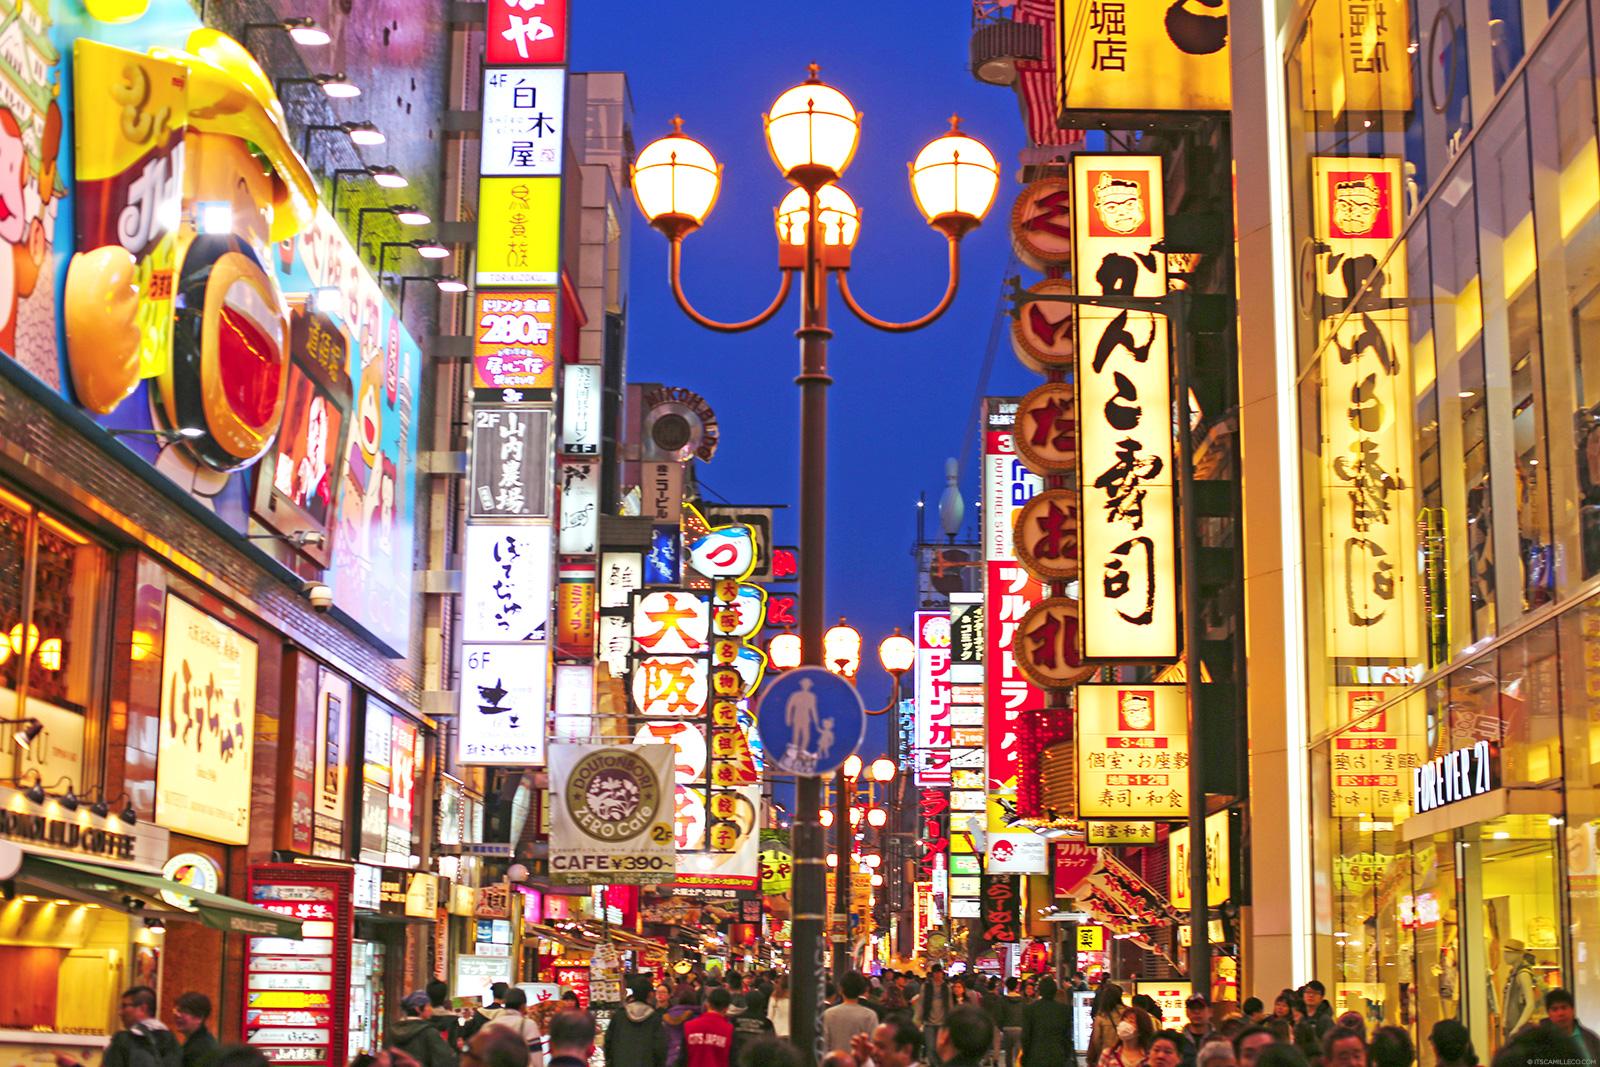 Osaka Travel Diary - www.itscamilleco.com